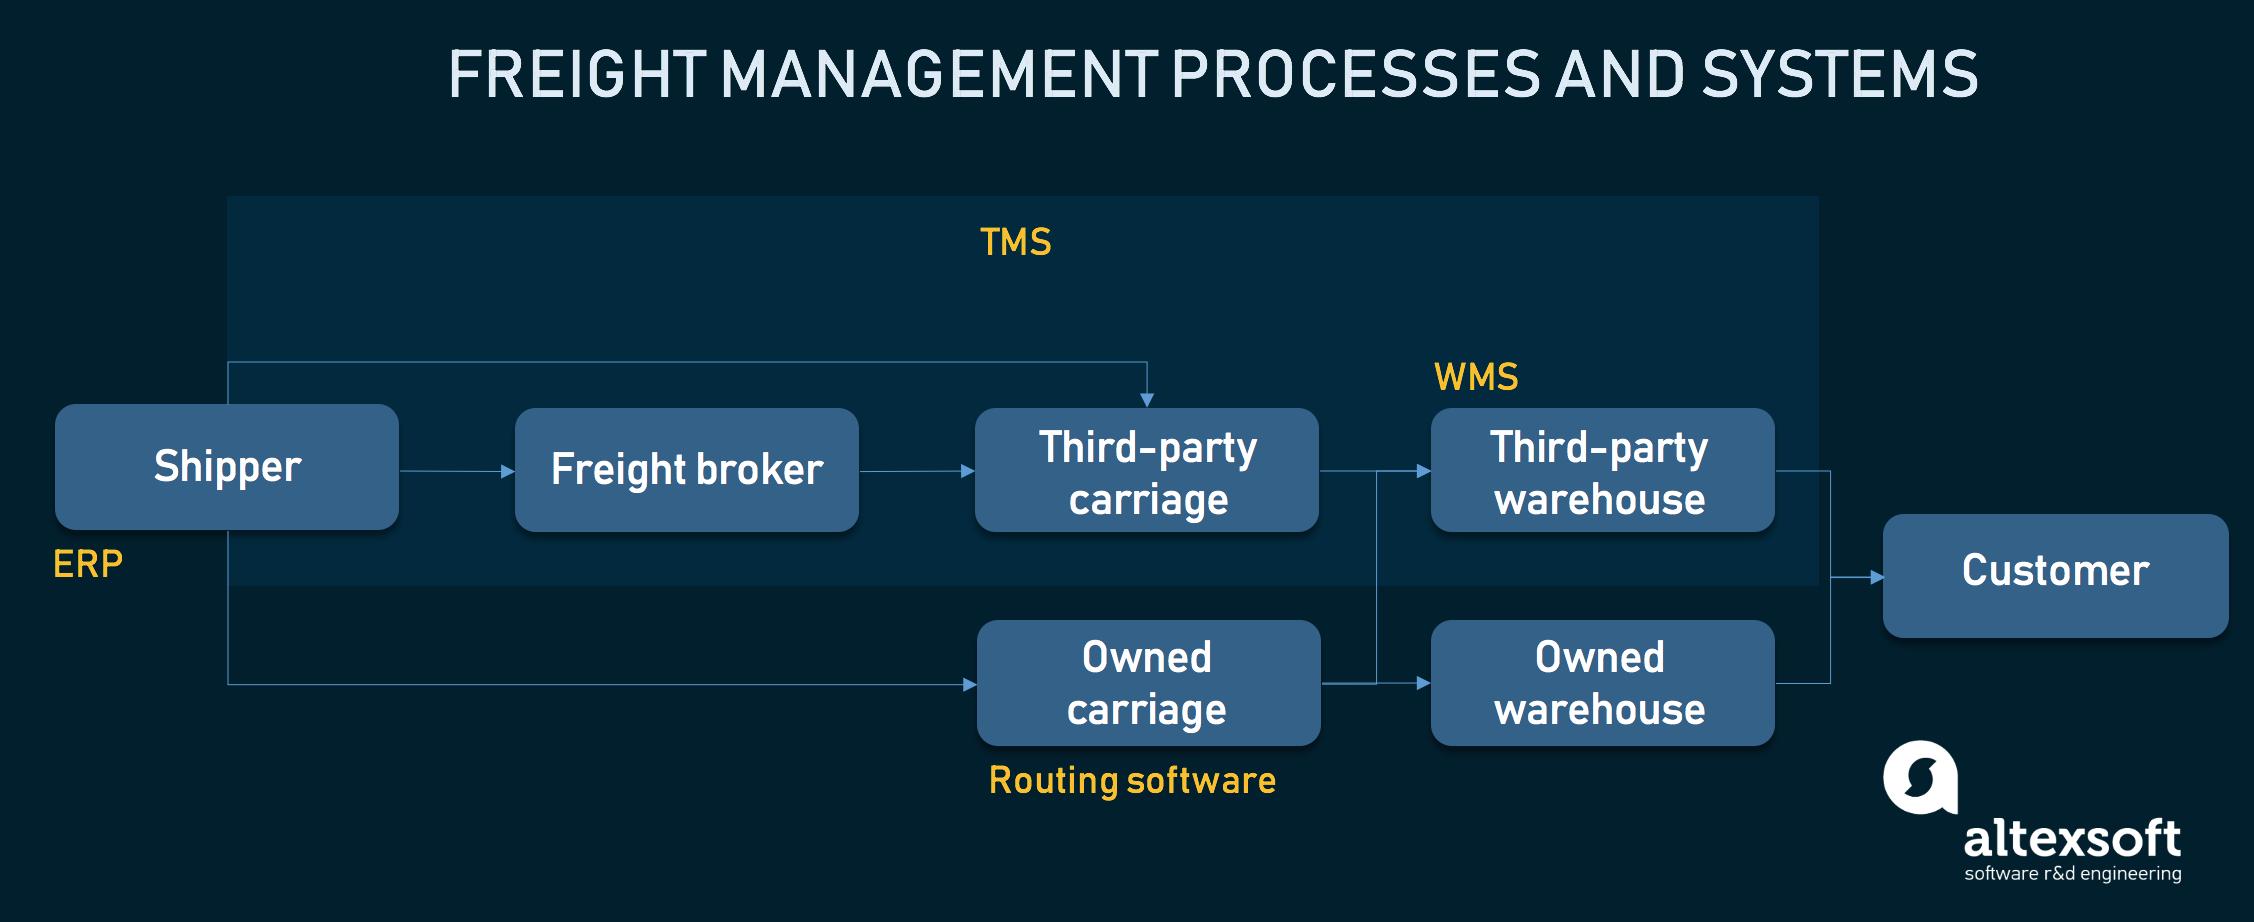 freight management processes